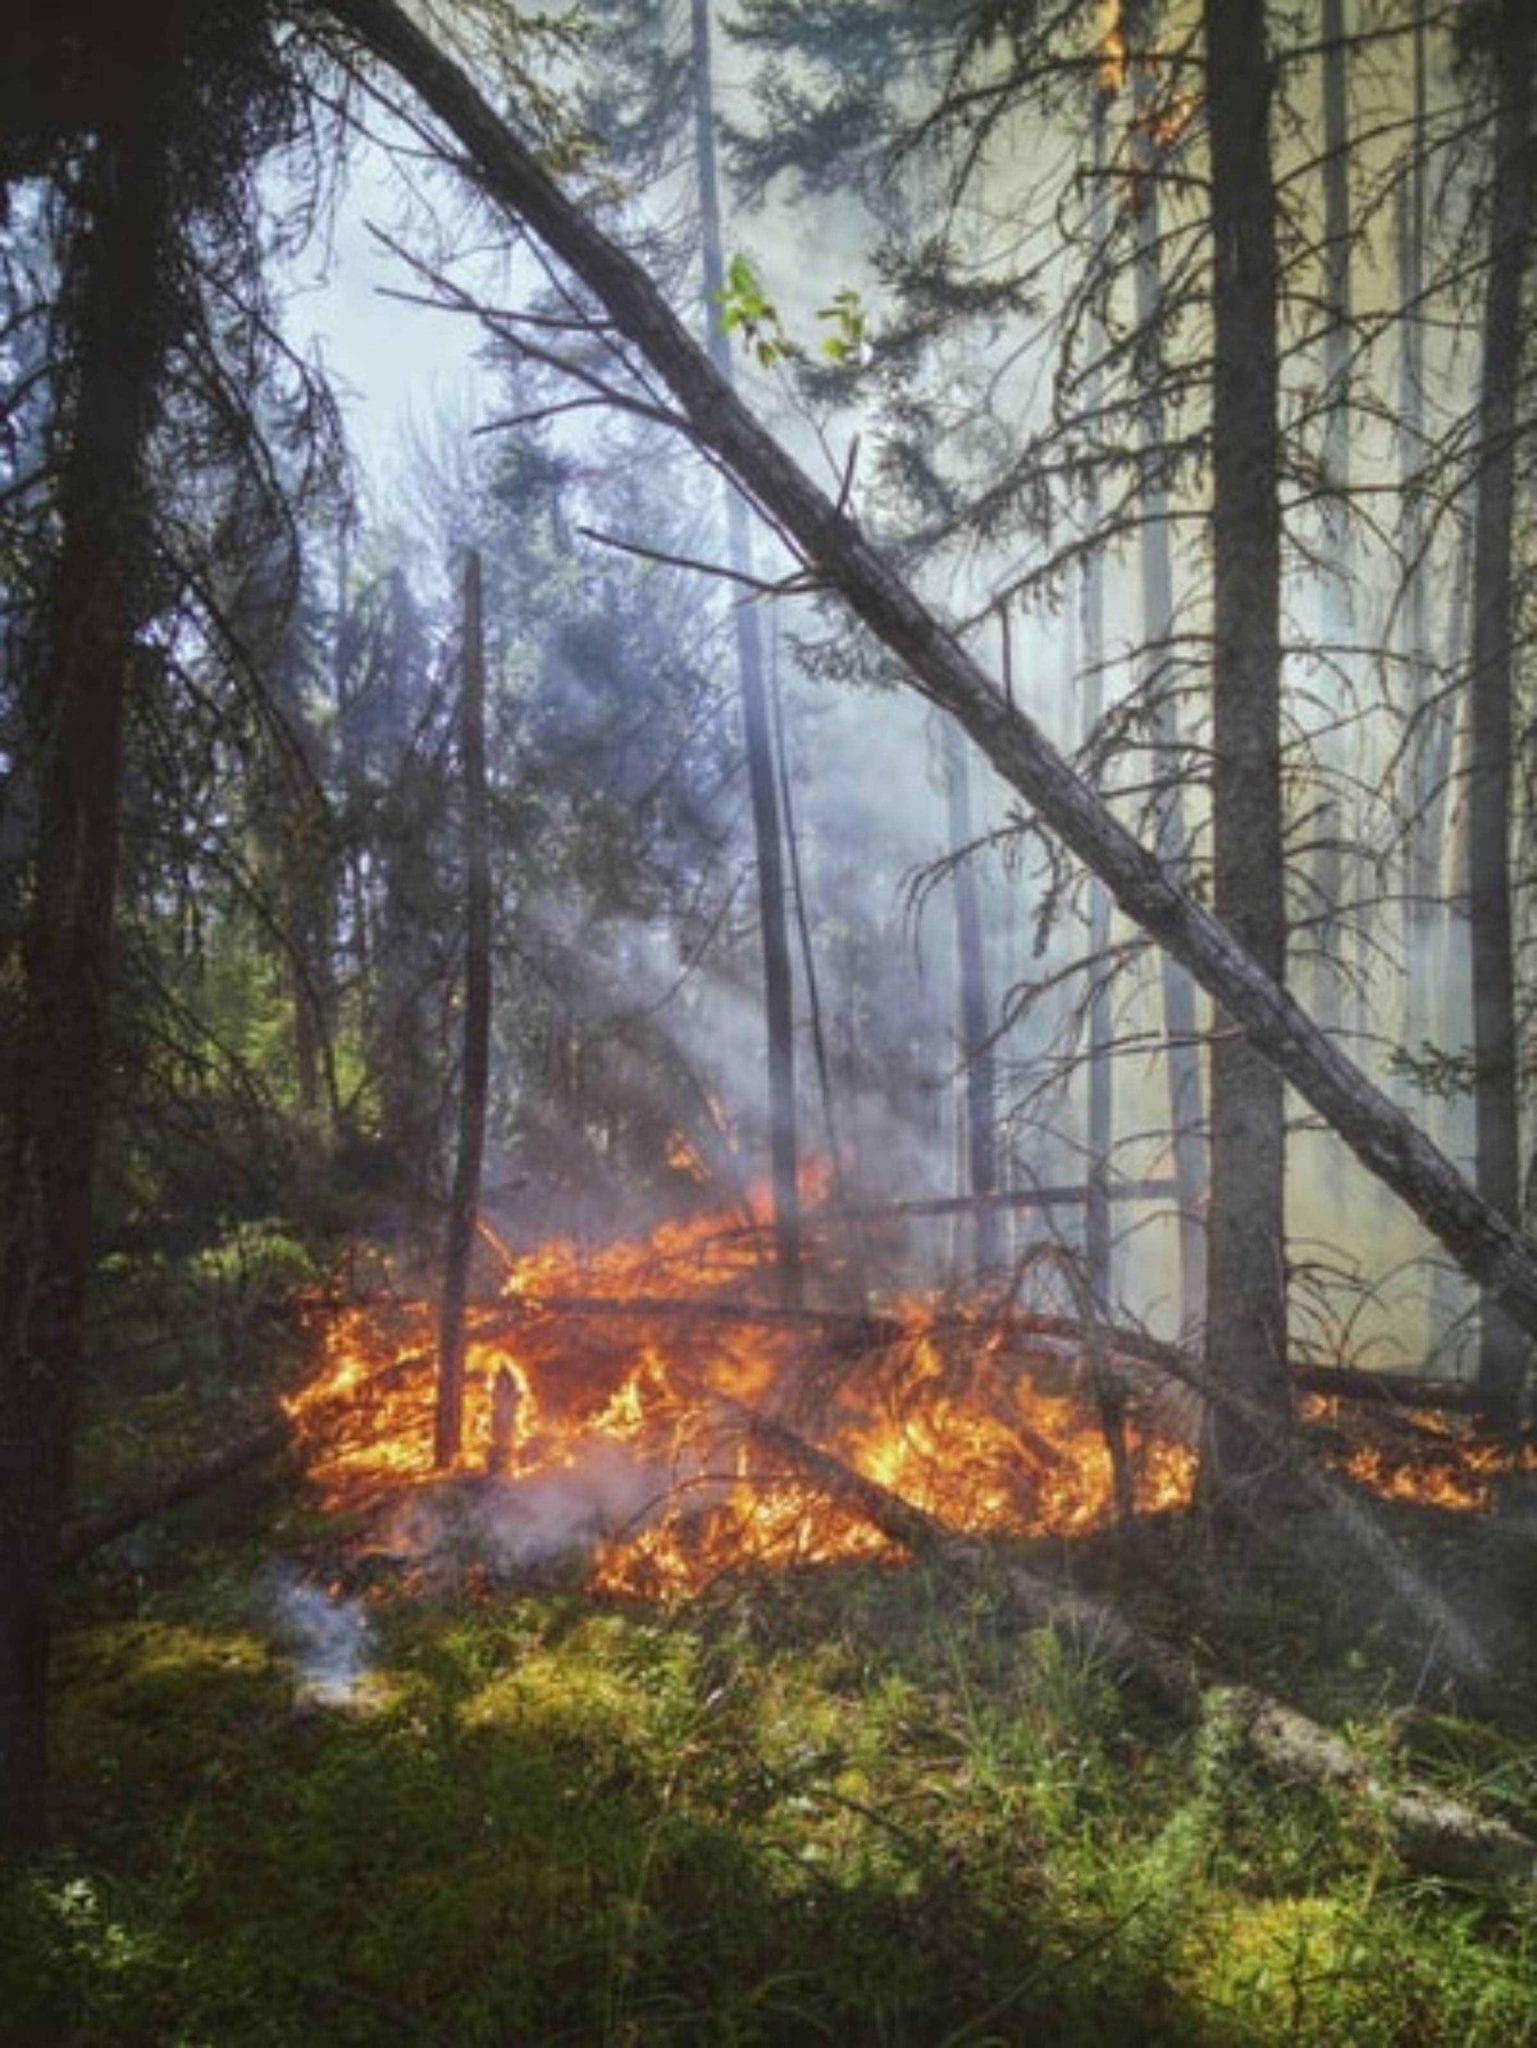 More than 20 Arizona wildfires blaze across the state.